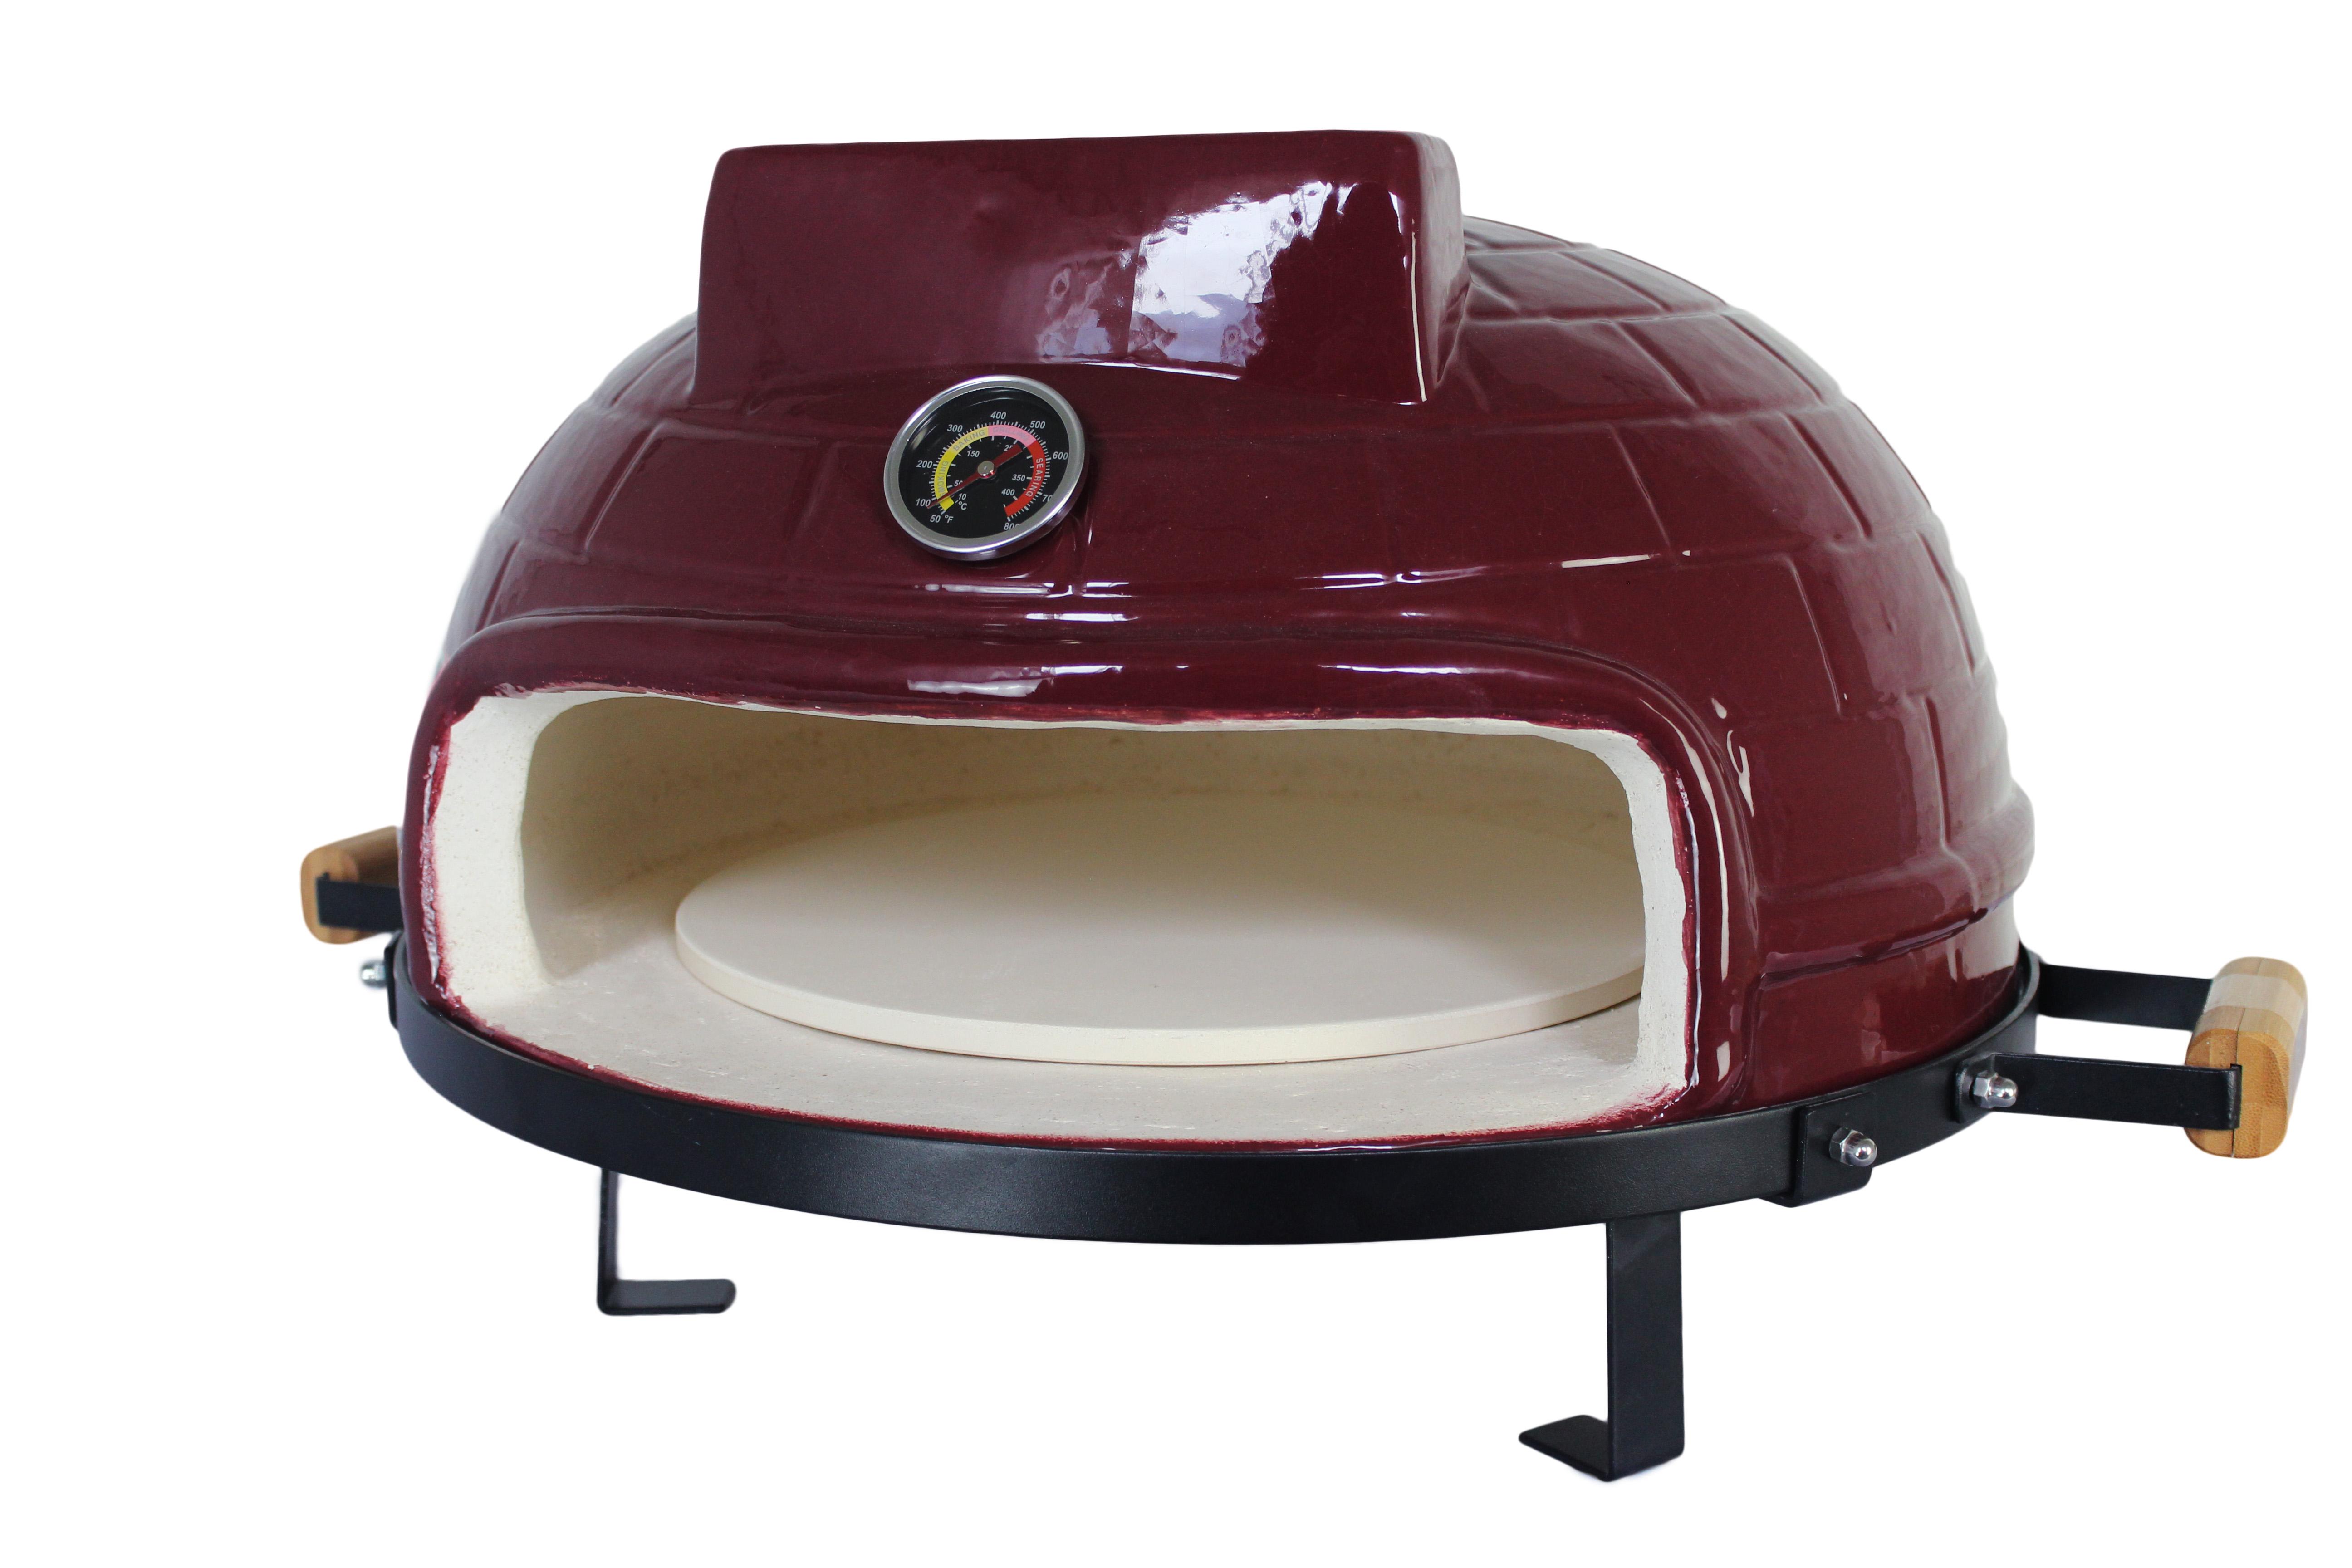 21inch brown wholesale Versatile Charcoal pizza oven, Ceramic Pizza Oven for versatile